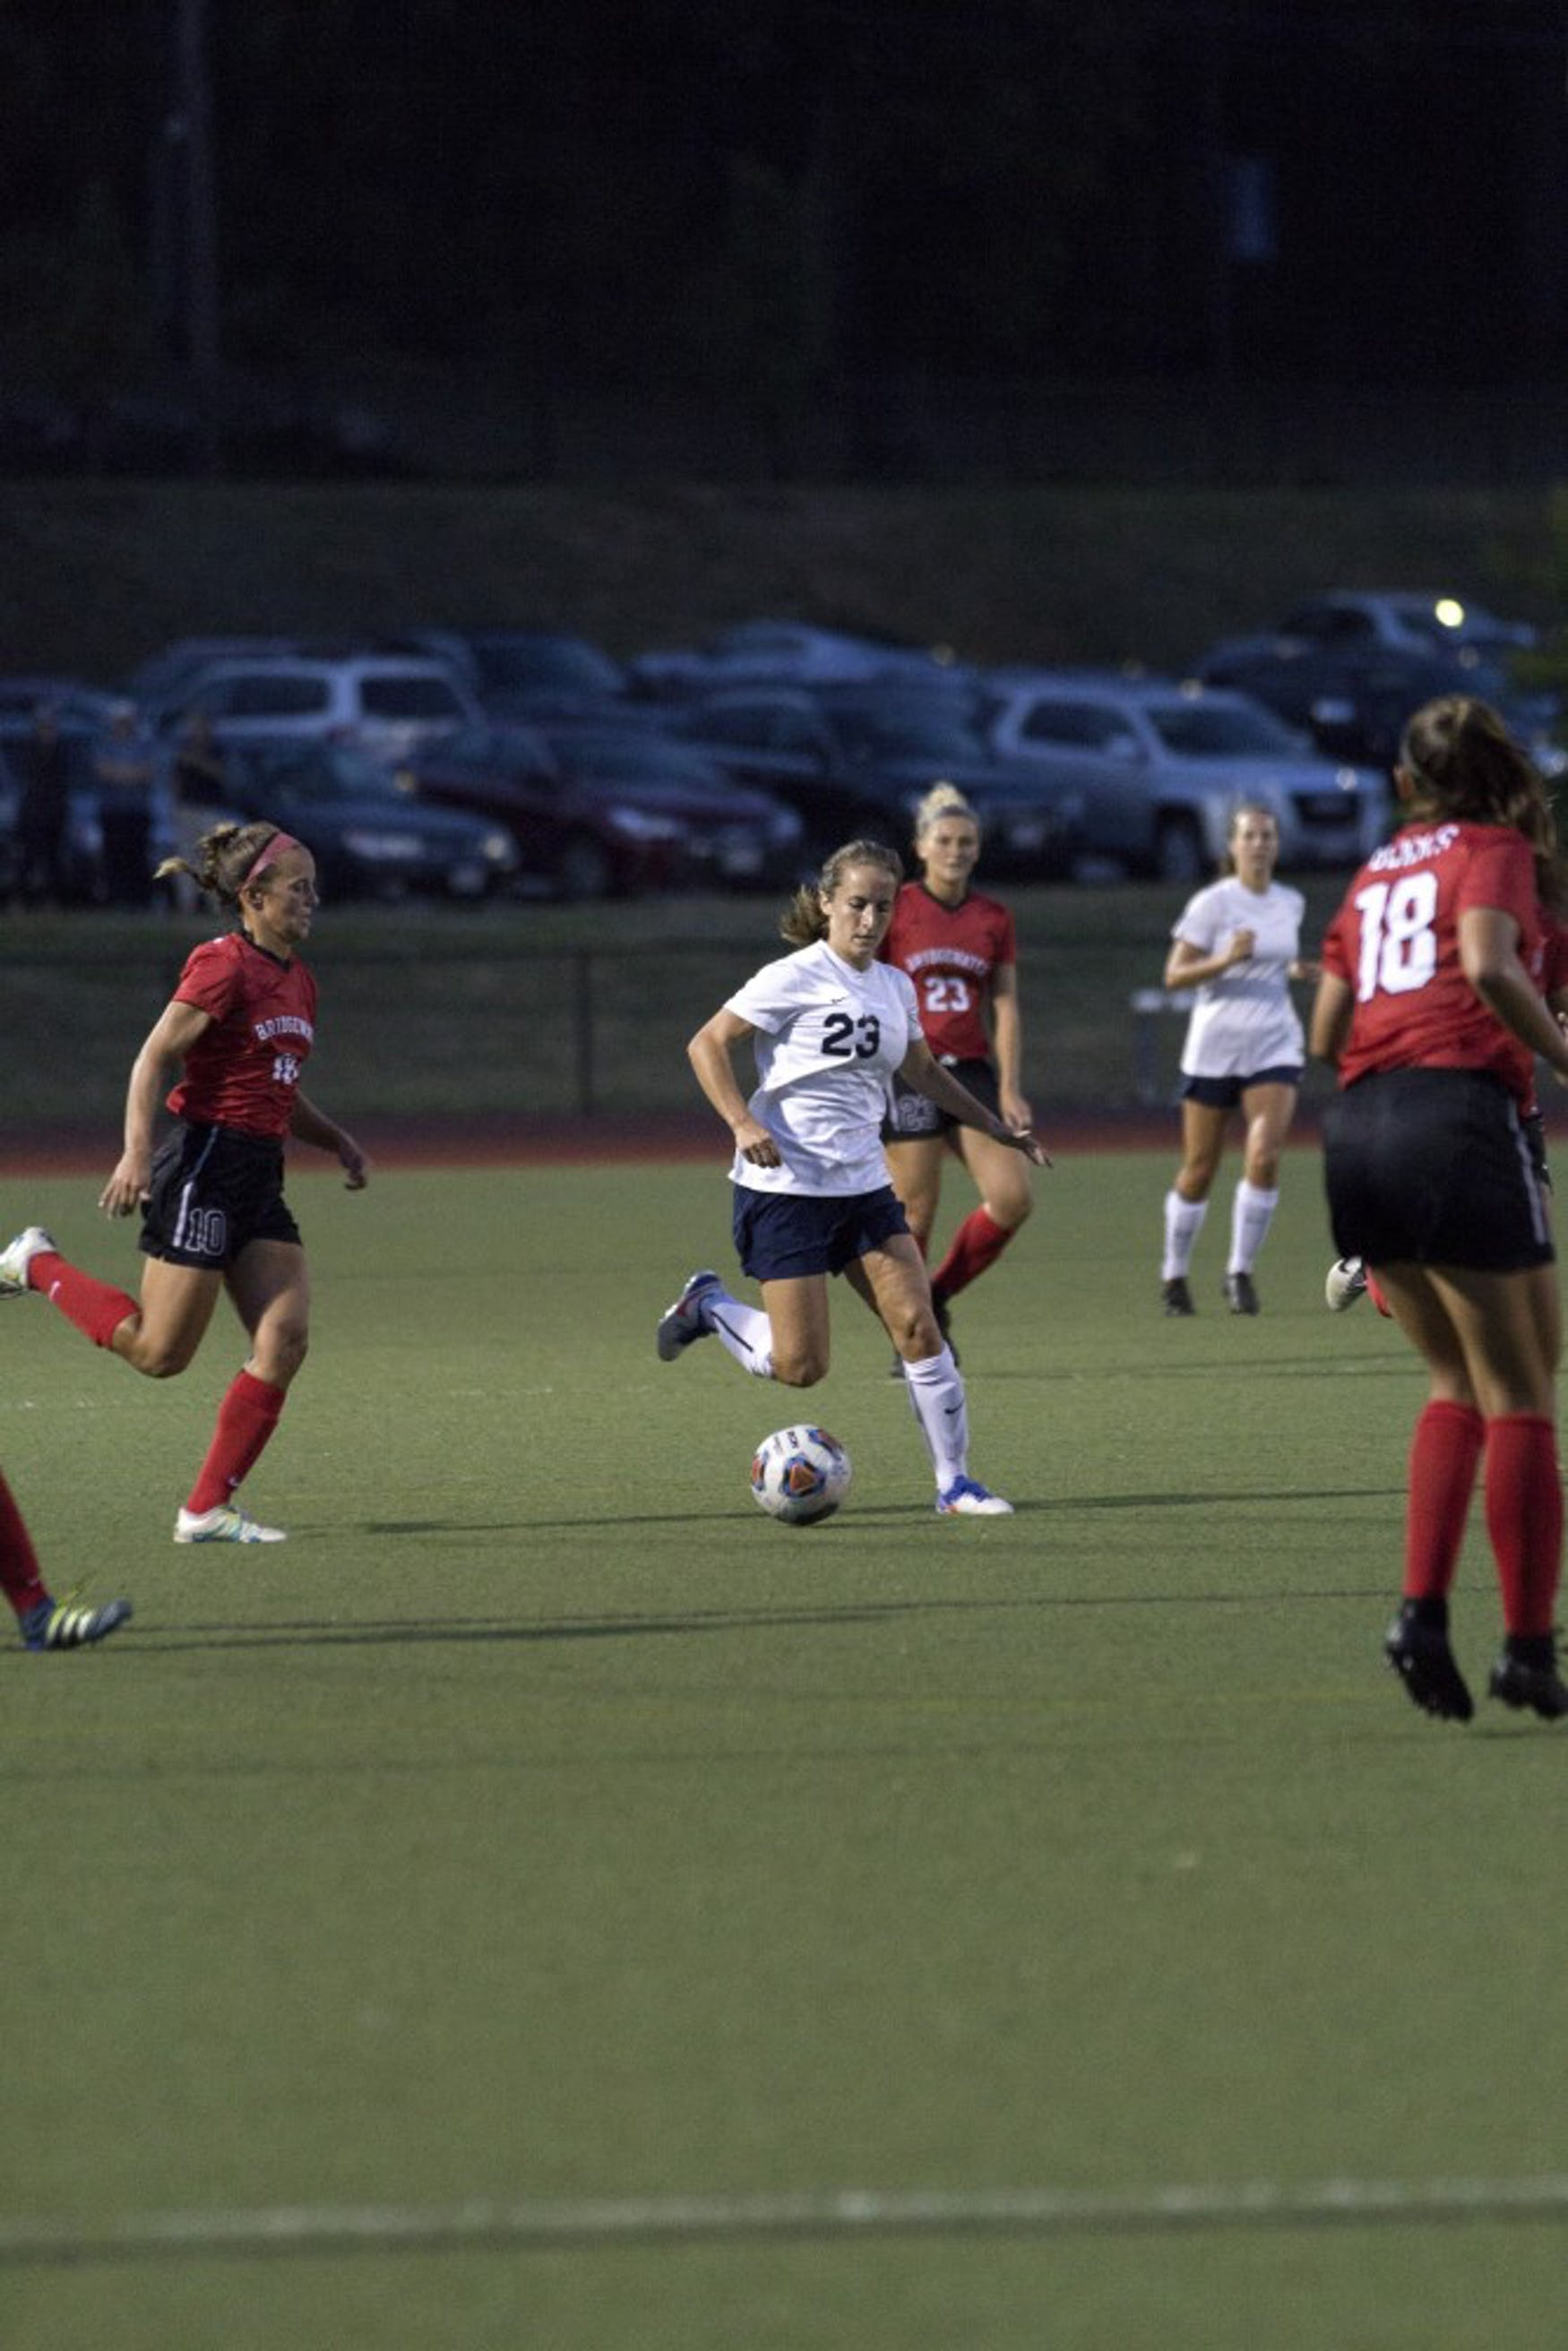 Soccer W vs. Bridgewater 9.5.17 NW 0348.jpg